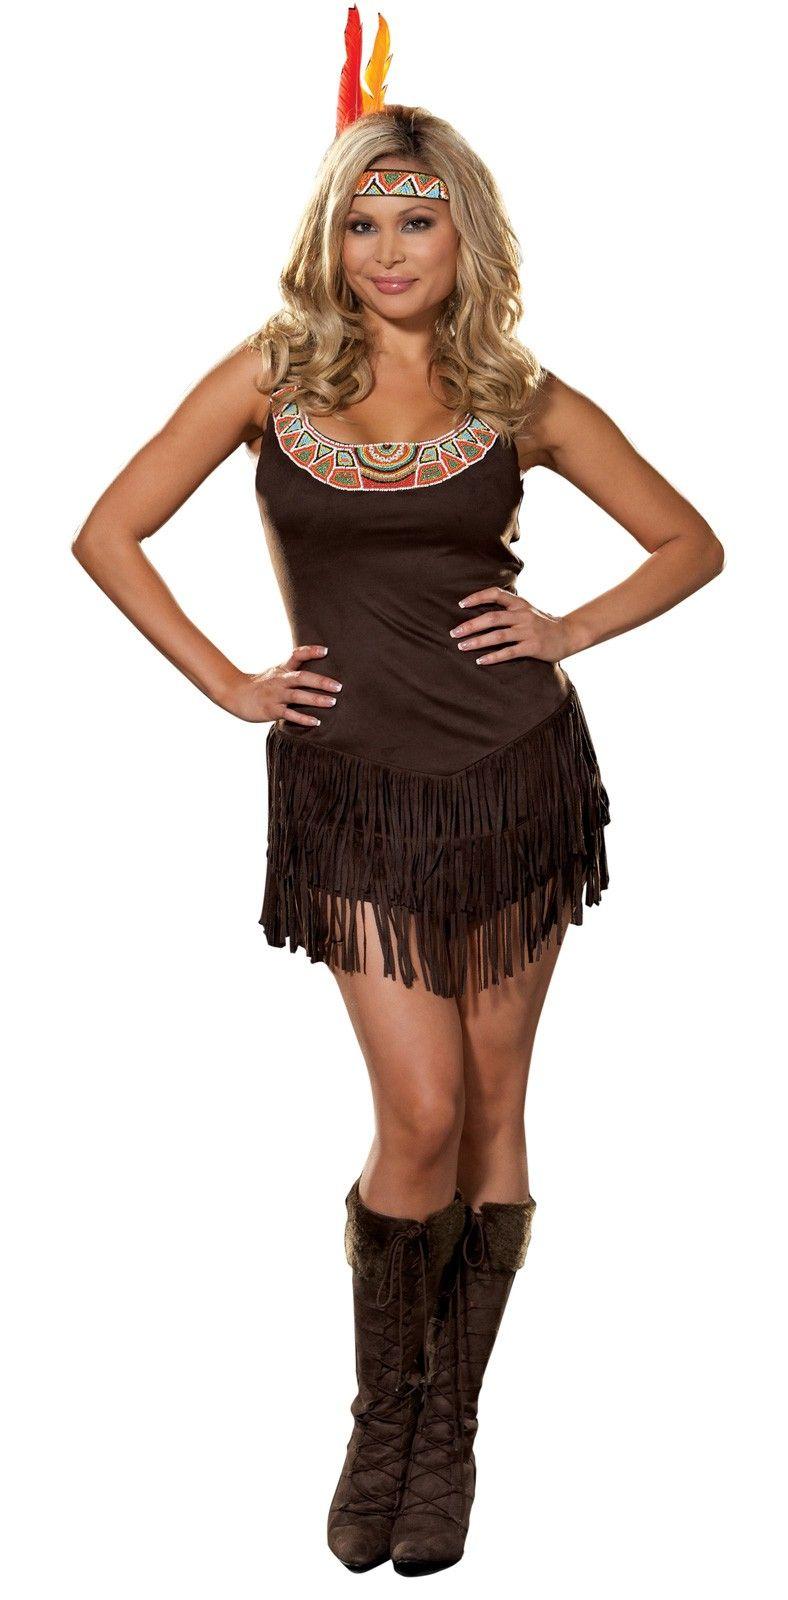 Pocahottie Adult Plus Womenu0027s Costume  sc 1 st  Pinterest & Pocahottie Adult Plus Womenu0027s Costume | Pocahontas Costumes ...